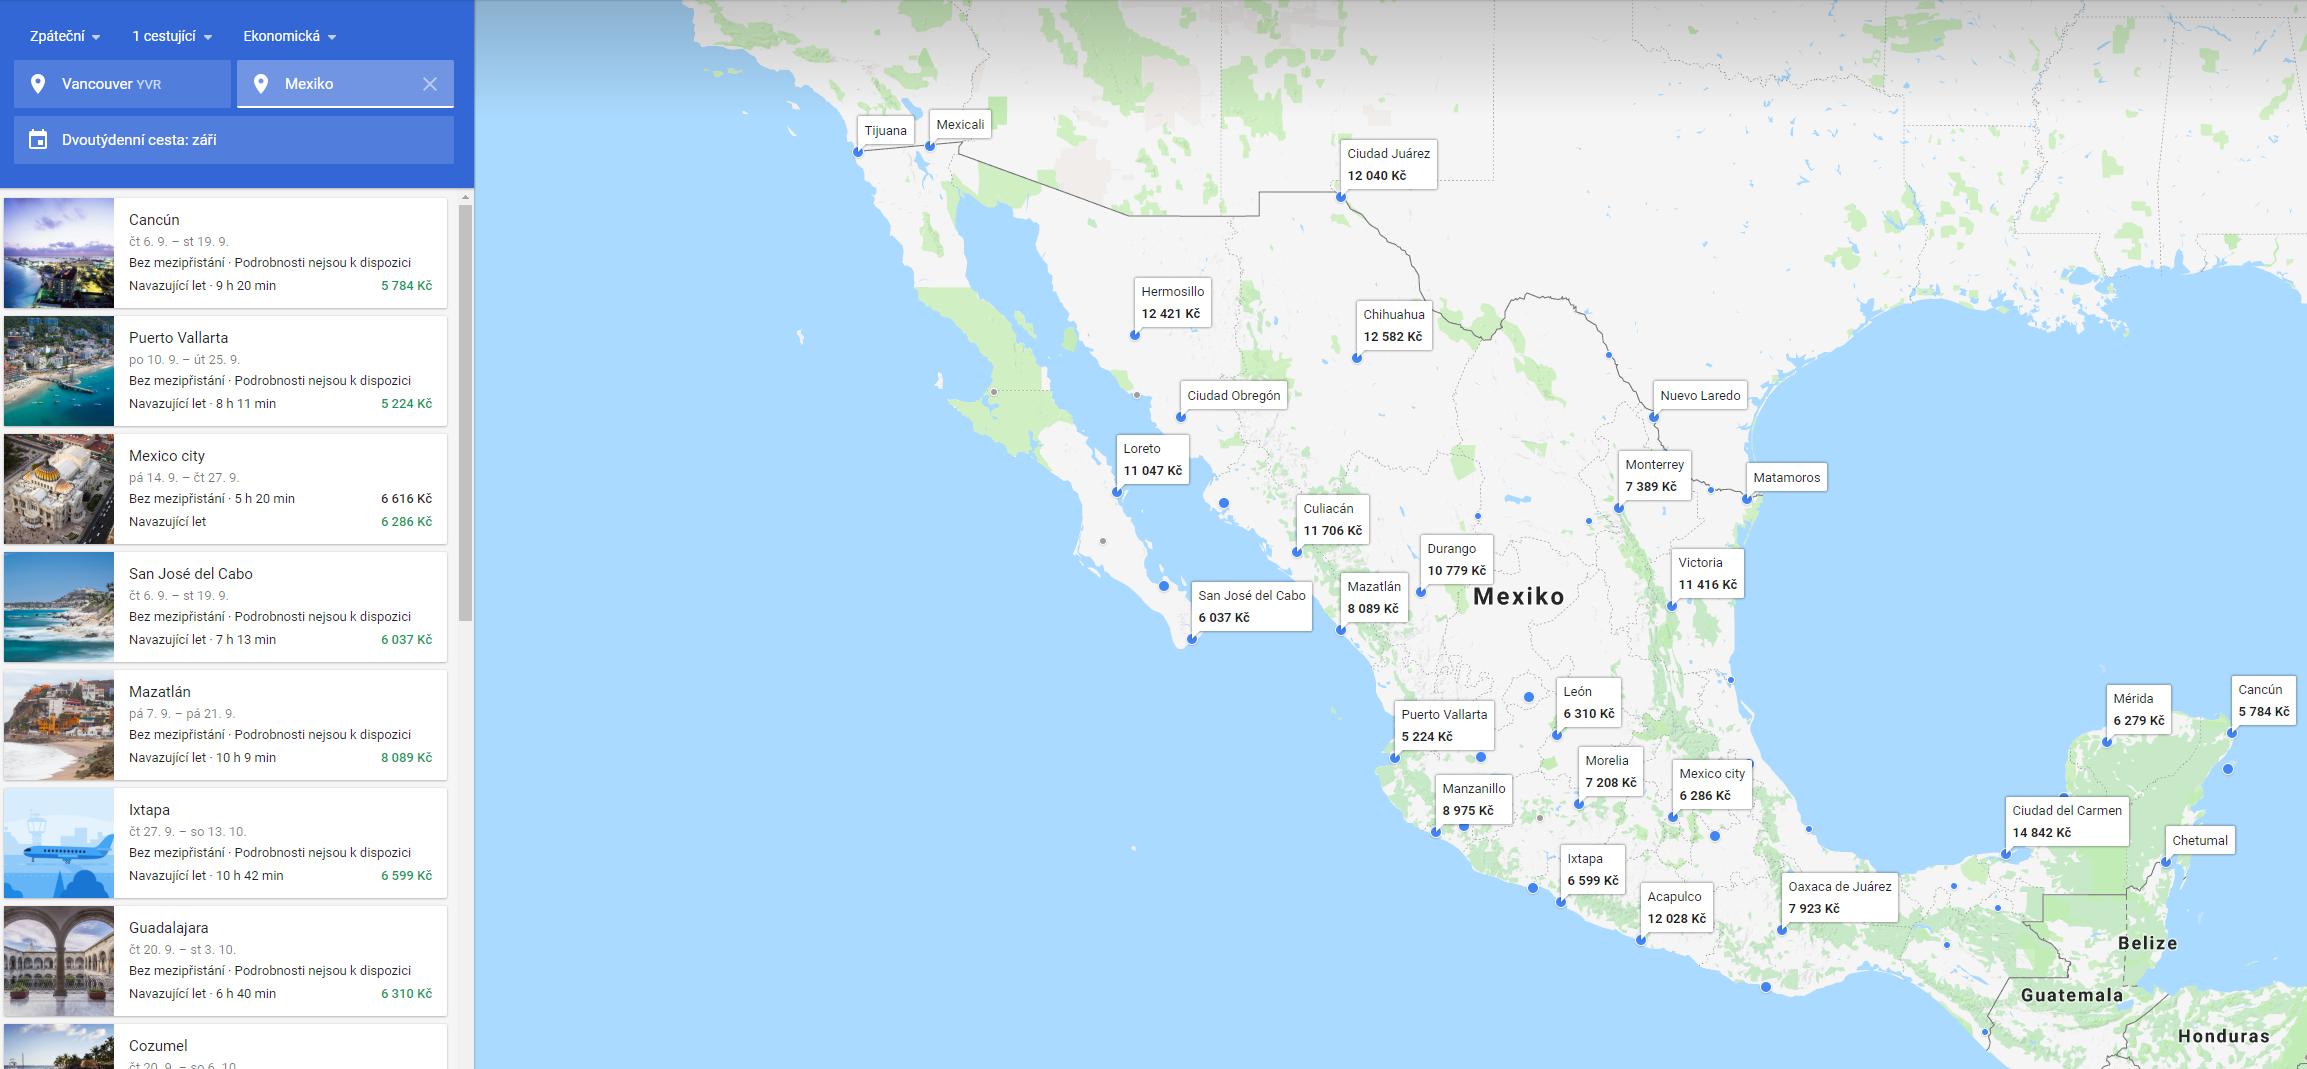 Levné letenky z Vancouveru do Mexika na Google Flights